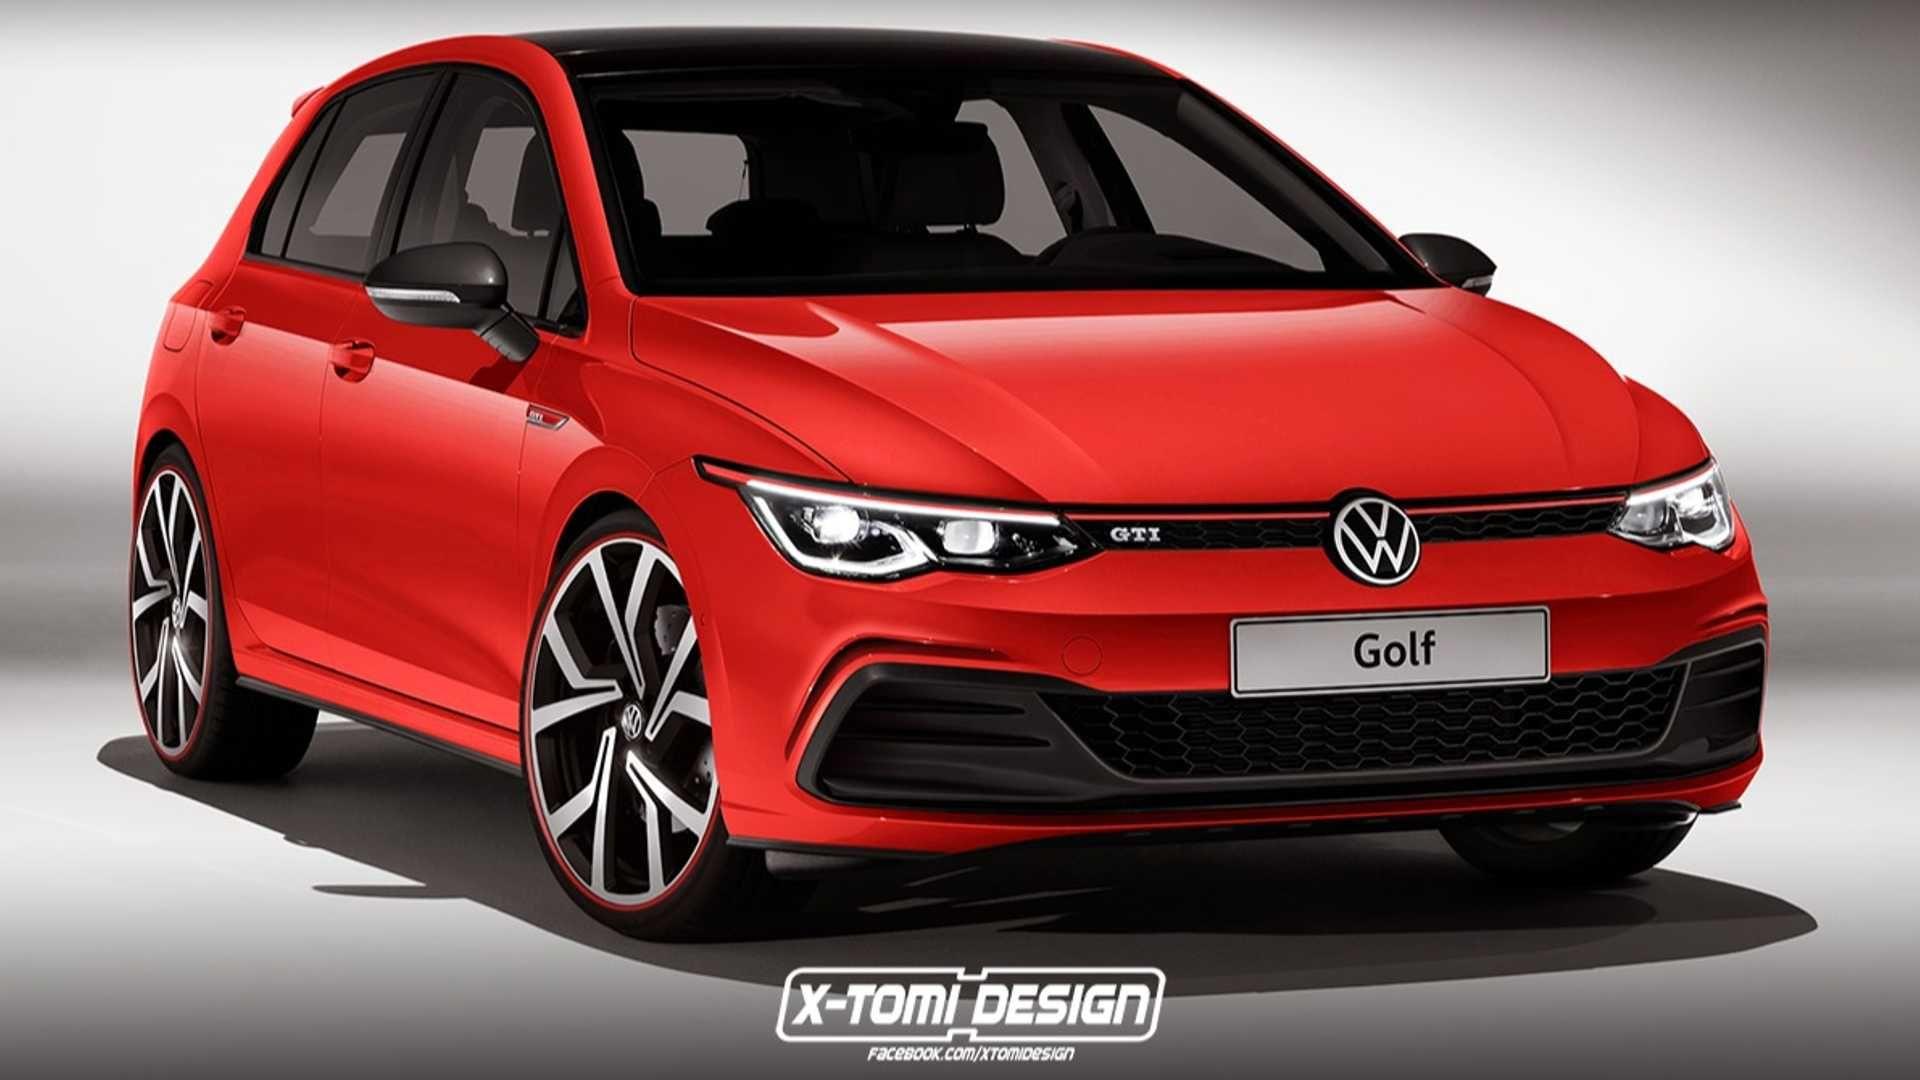 Volkswagen Gti 2021 Release Date Pricing In 2020 Volkswagen Gti Volkswagen Golf R Volkswagen Golf Gti